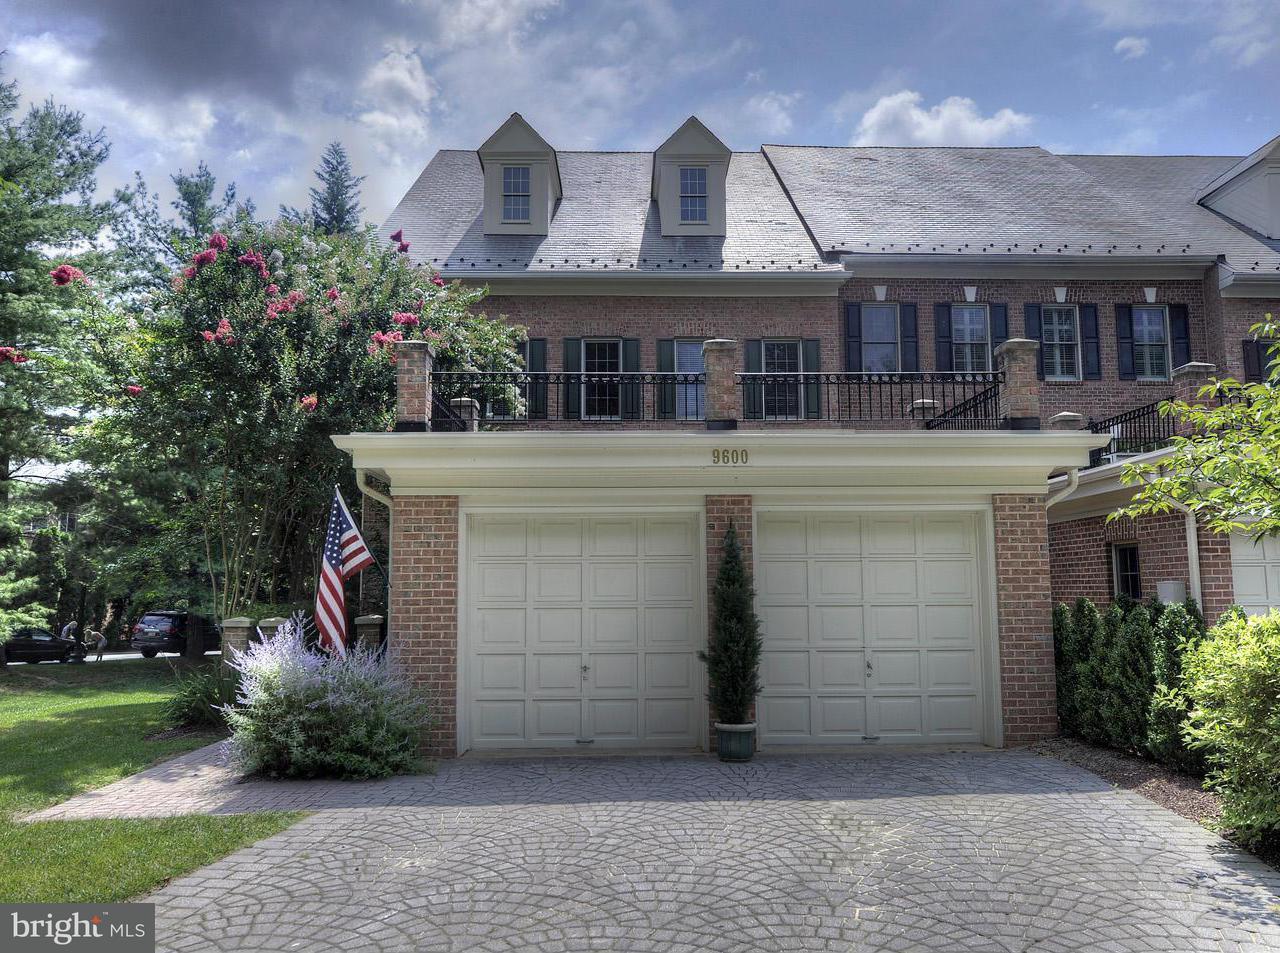 Townhouse for Sale at 9600 Beman Woods Way 9600 Beman Woods Way Potomac, Maryland 20854 United States